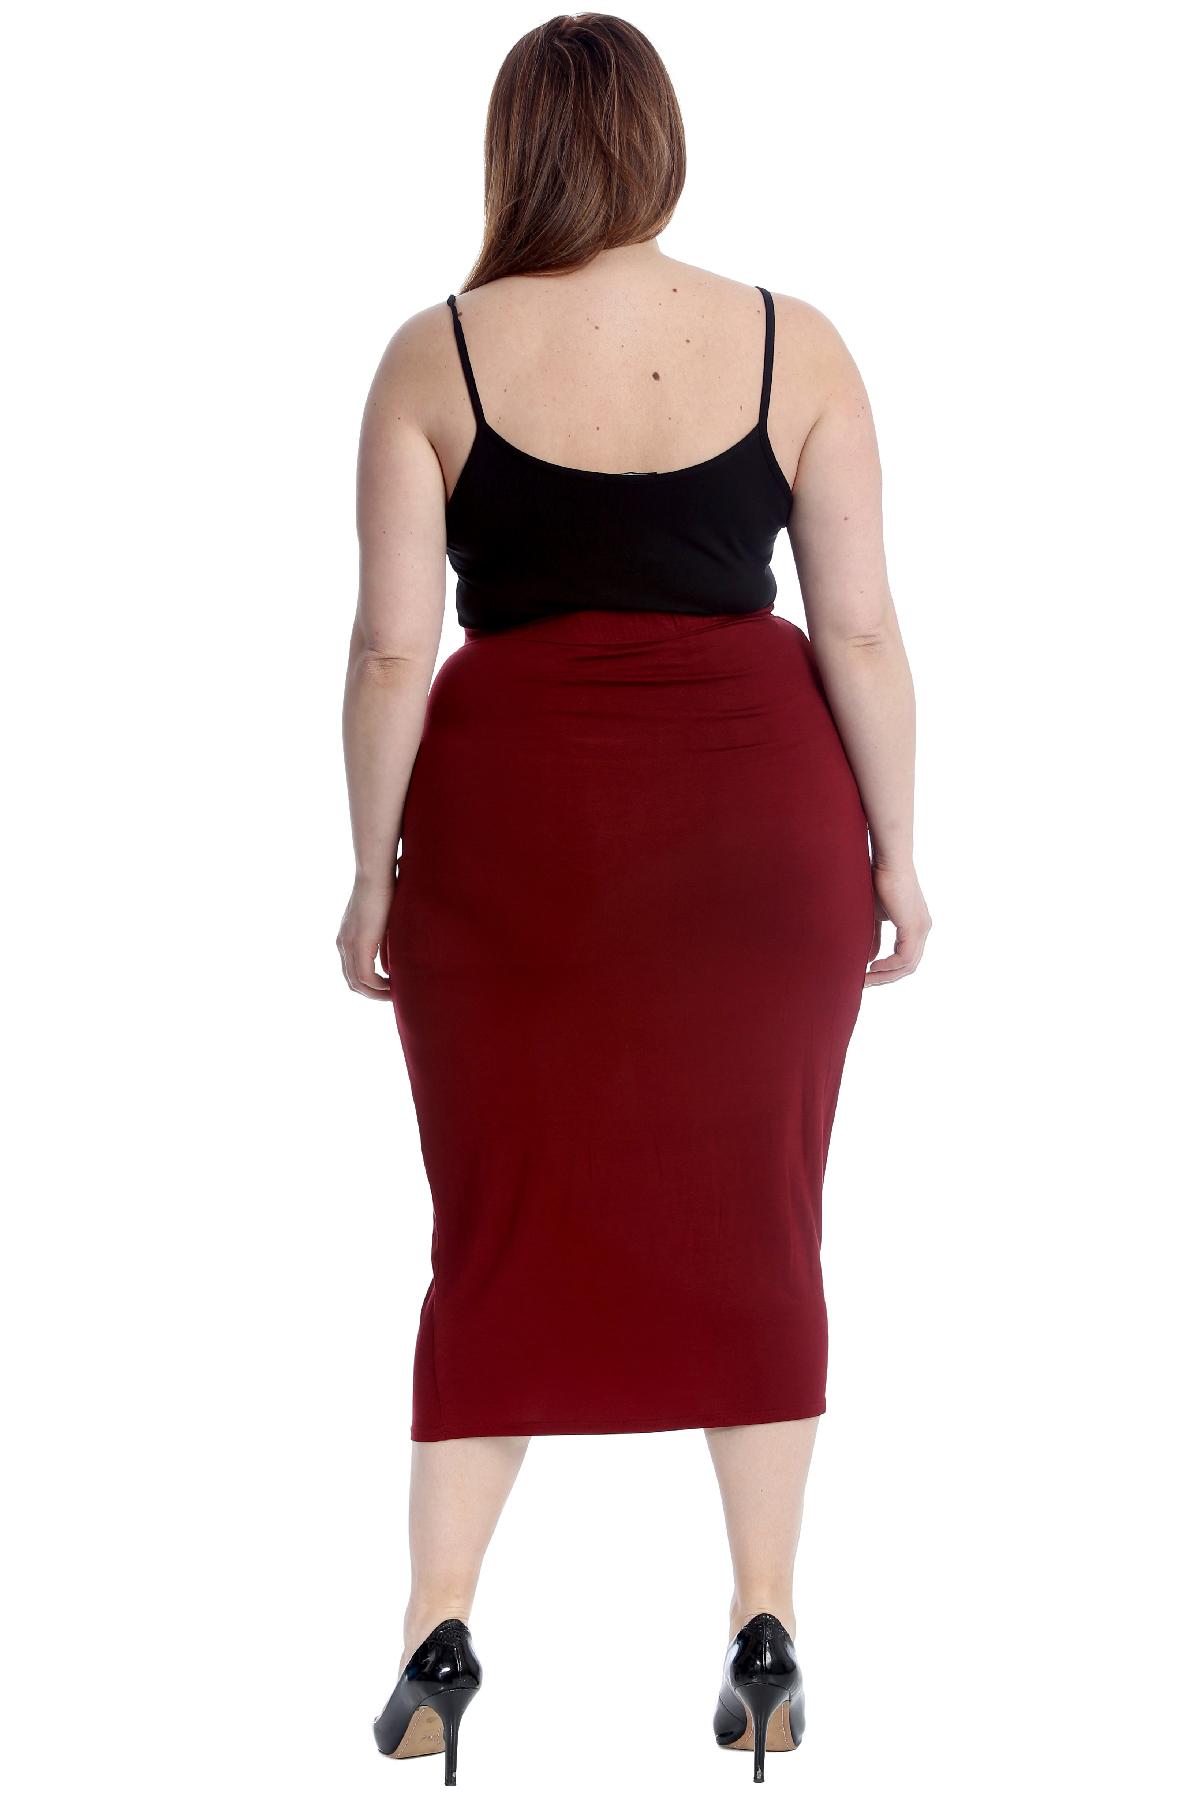 Neu Damen Übergröße Bodycon Bleistift Röcke Frau Stretch Skirt Lange Büroarbeit Röcke